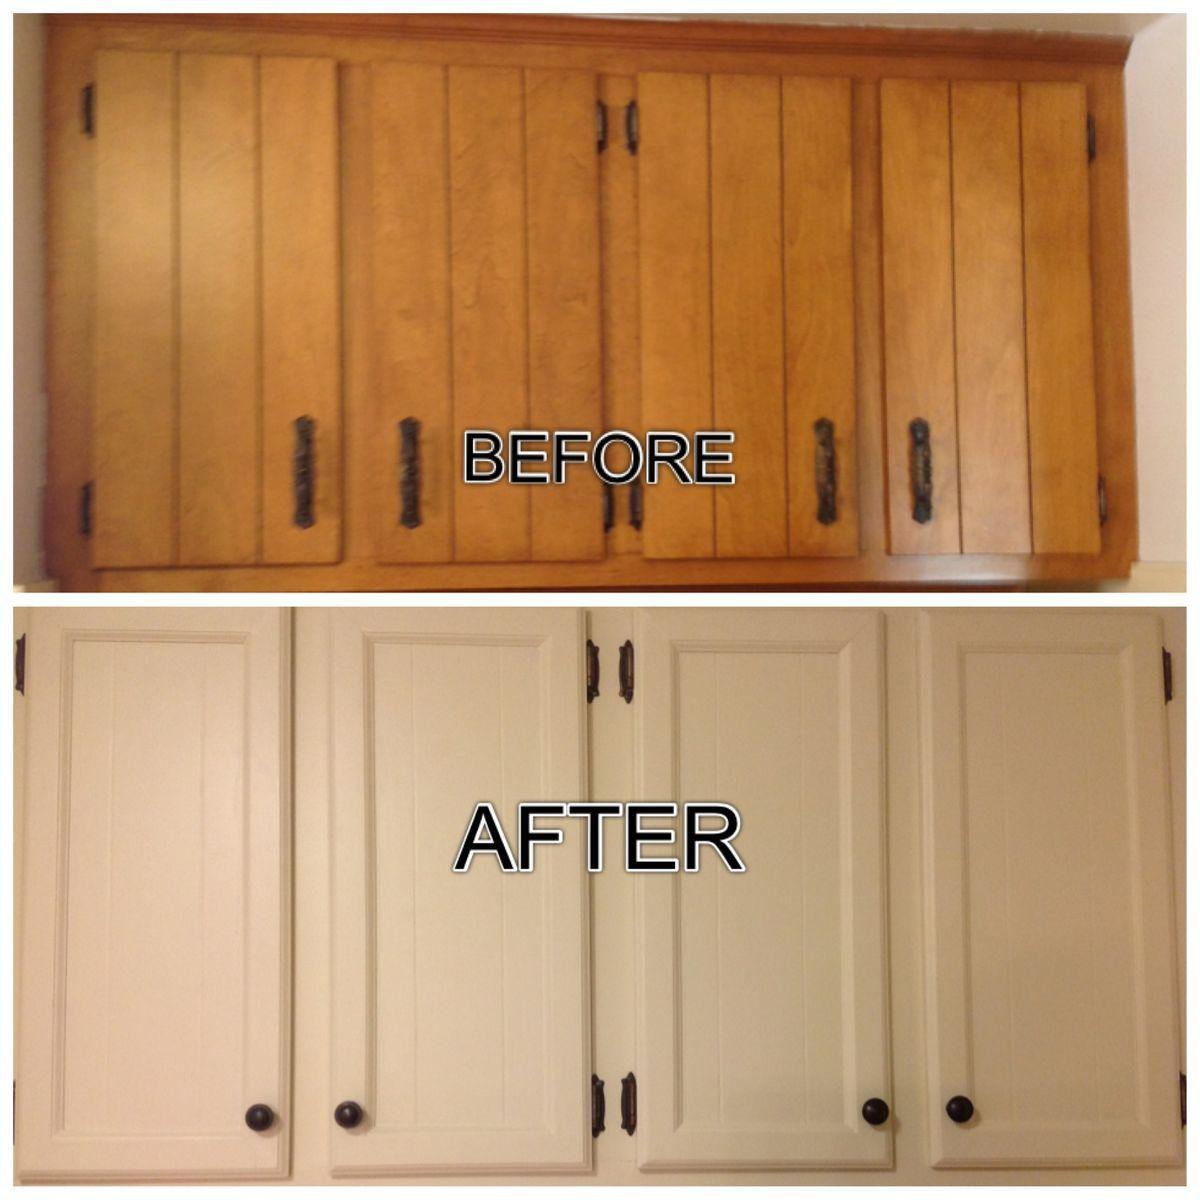 Updating Knotty Pine Kitchen Cabinets: De5e09325c13f04197d098dc54700c6b.jpg 1,200×1,200 Pixels